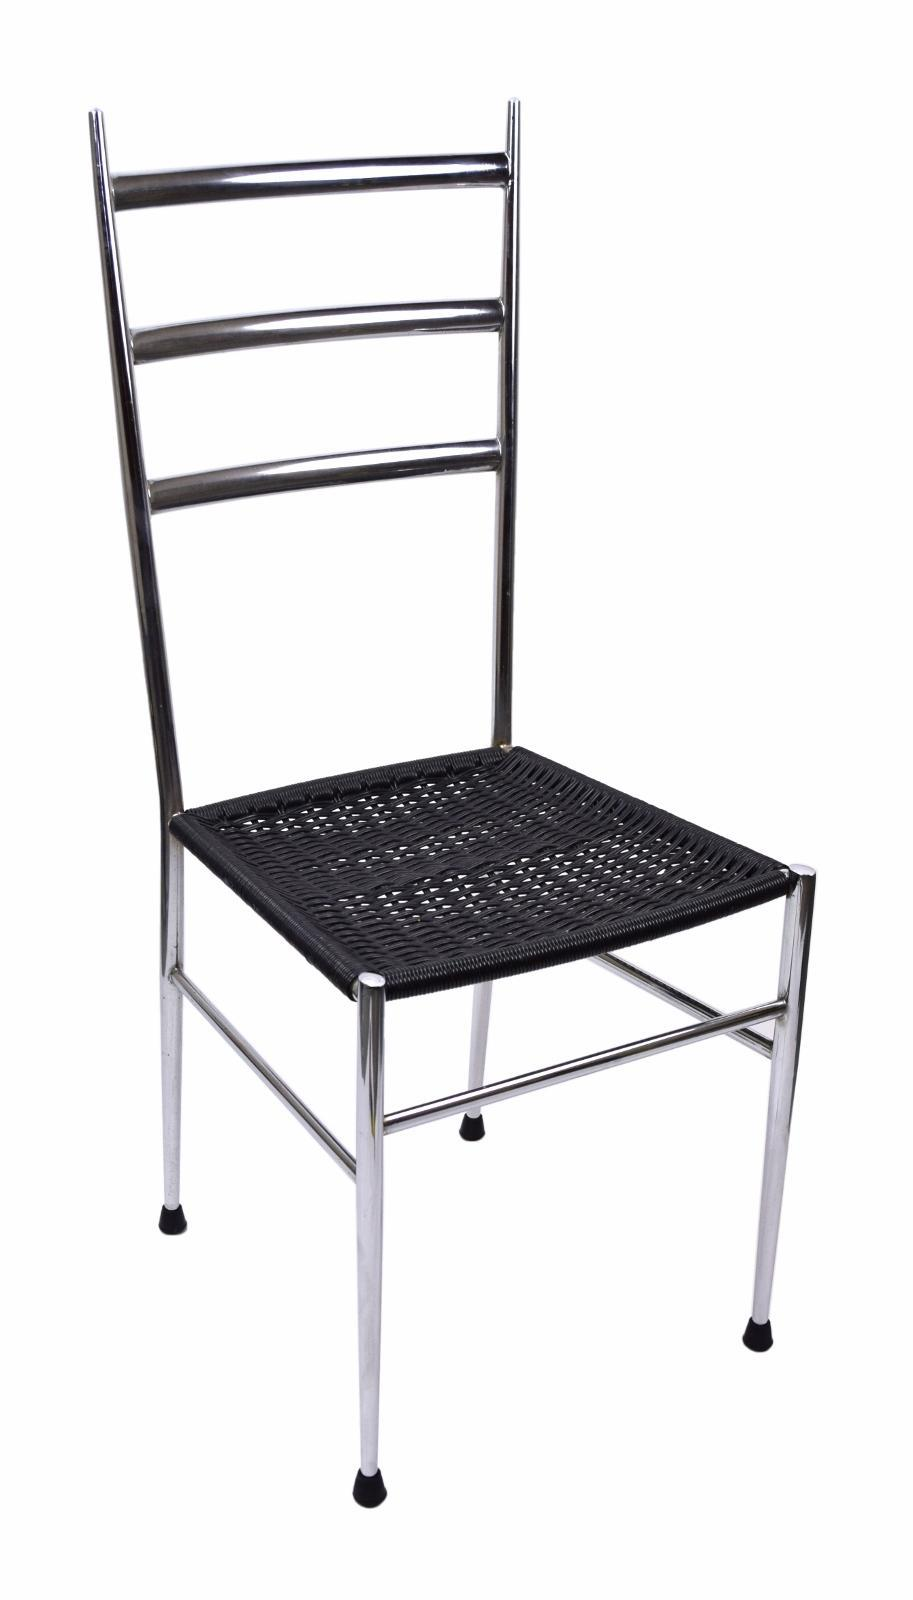 Italian Mid Century Modern Gio Ponti Style Dining Chairs   A Pair   Image 5